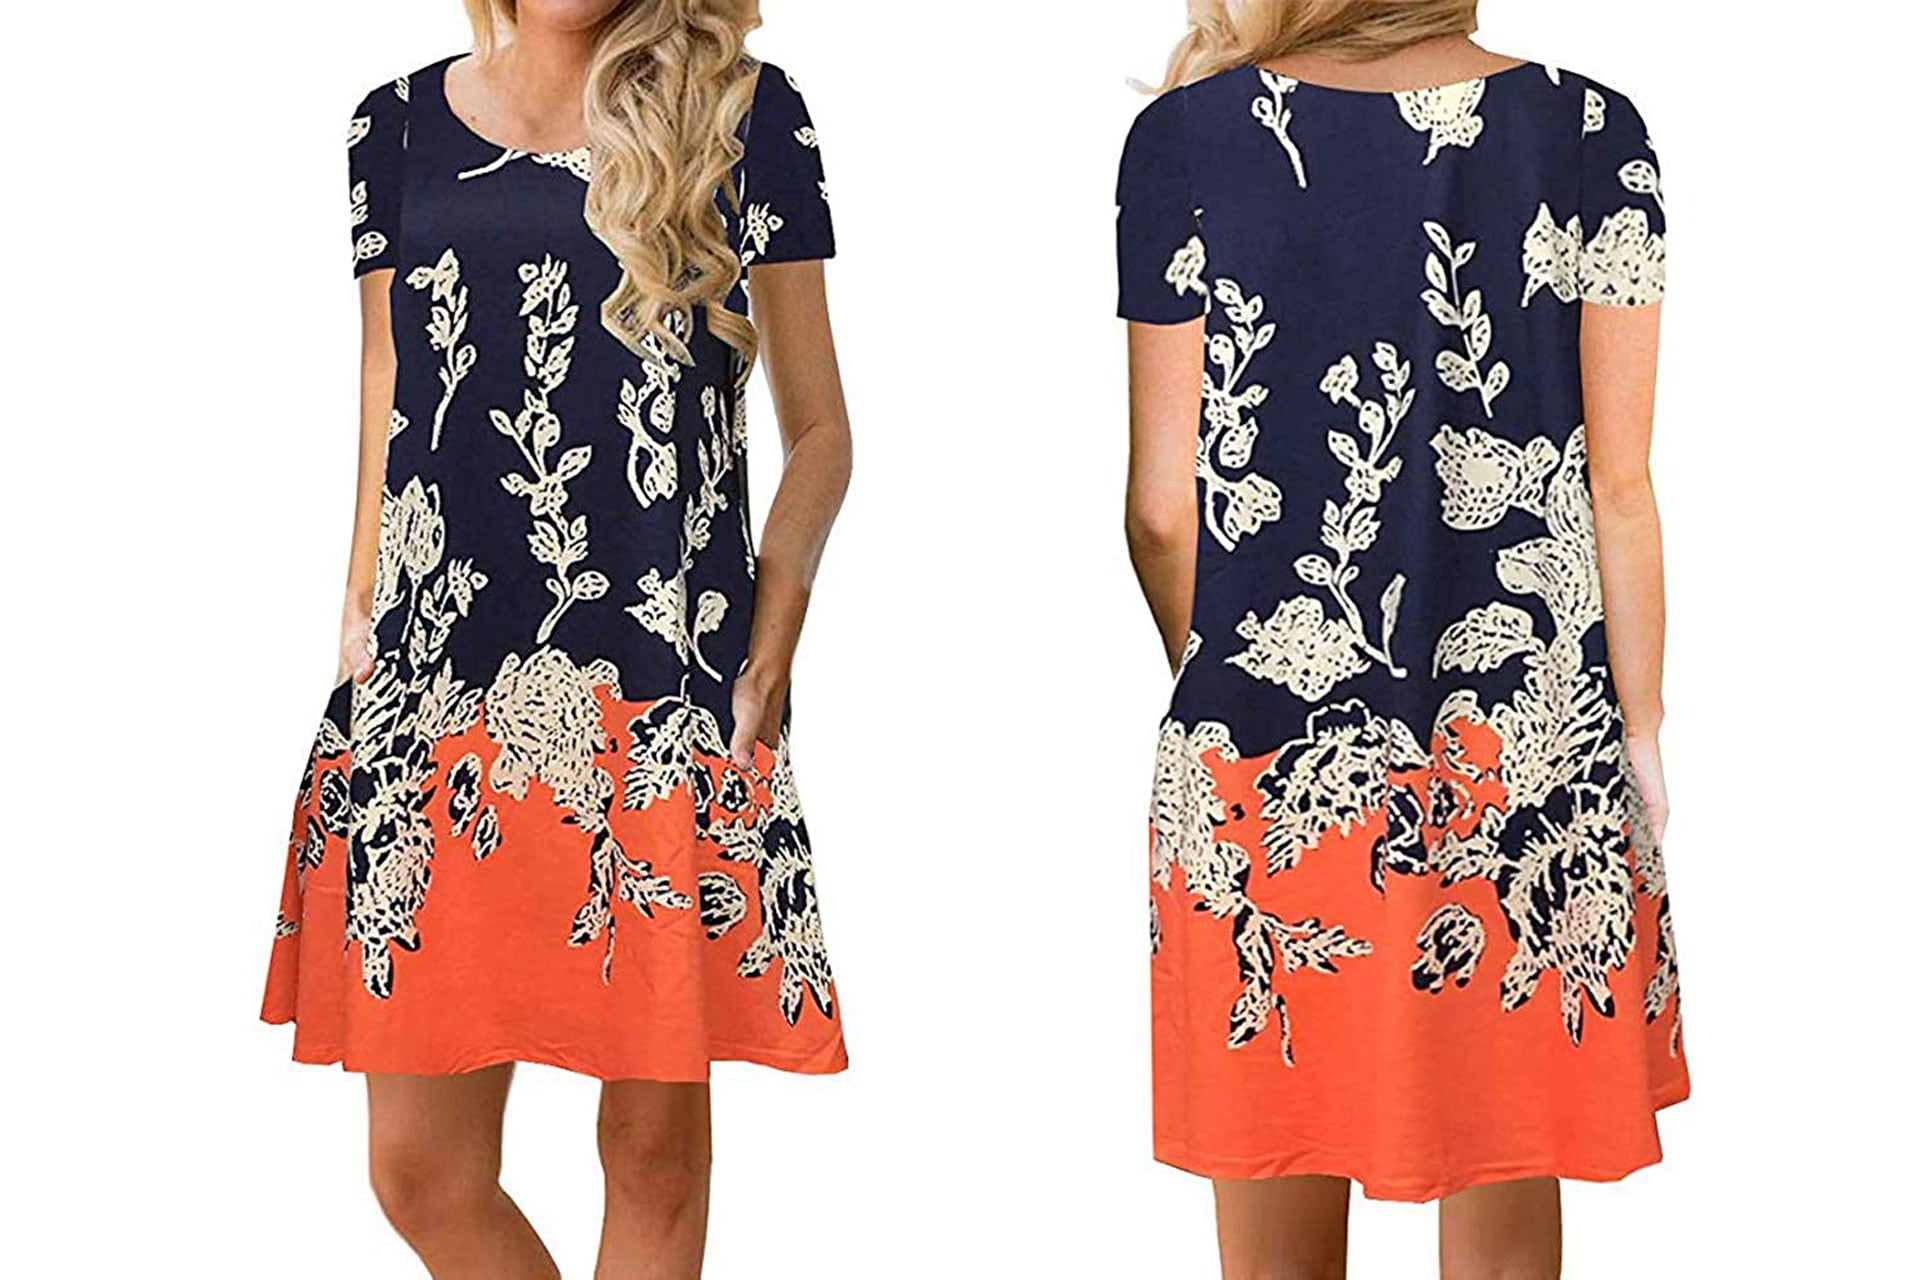 Sherosa Womens Summer Floral Print Sleeveless Sundress